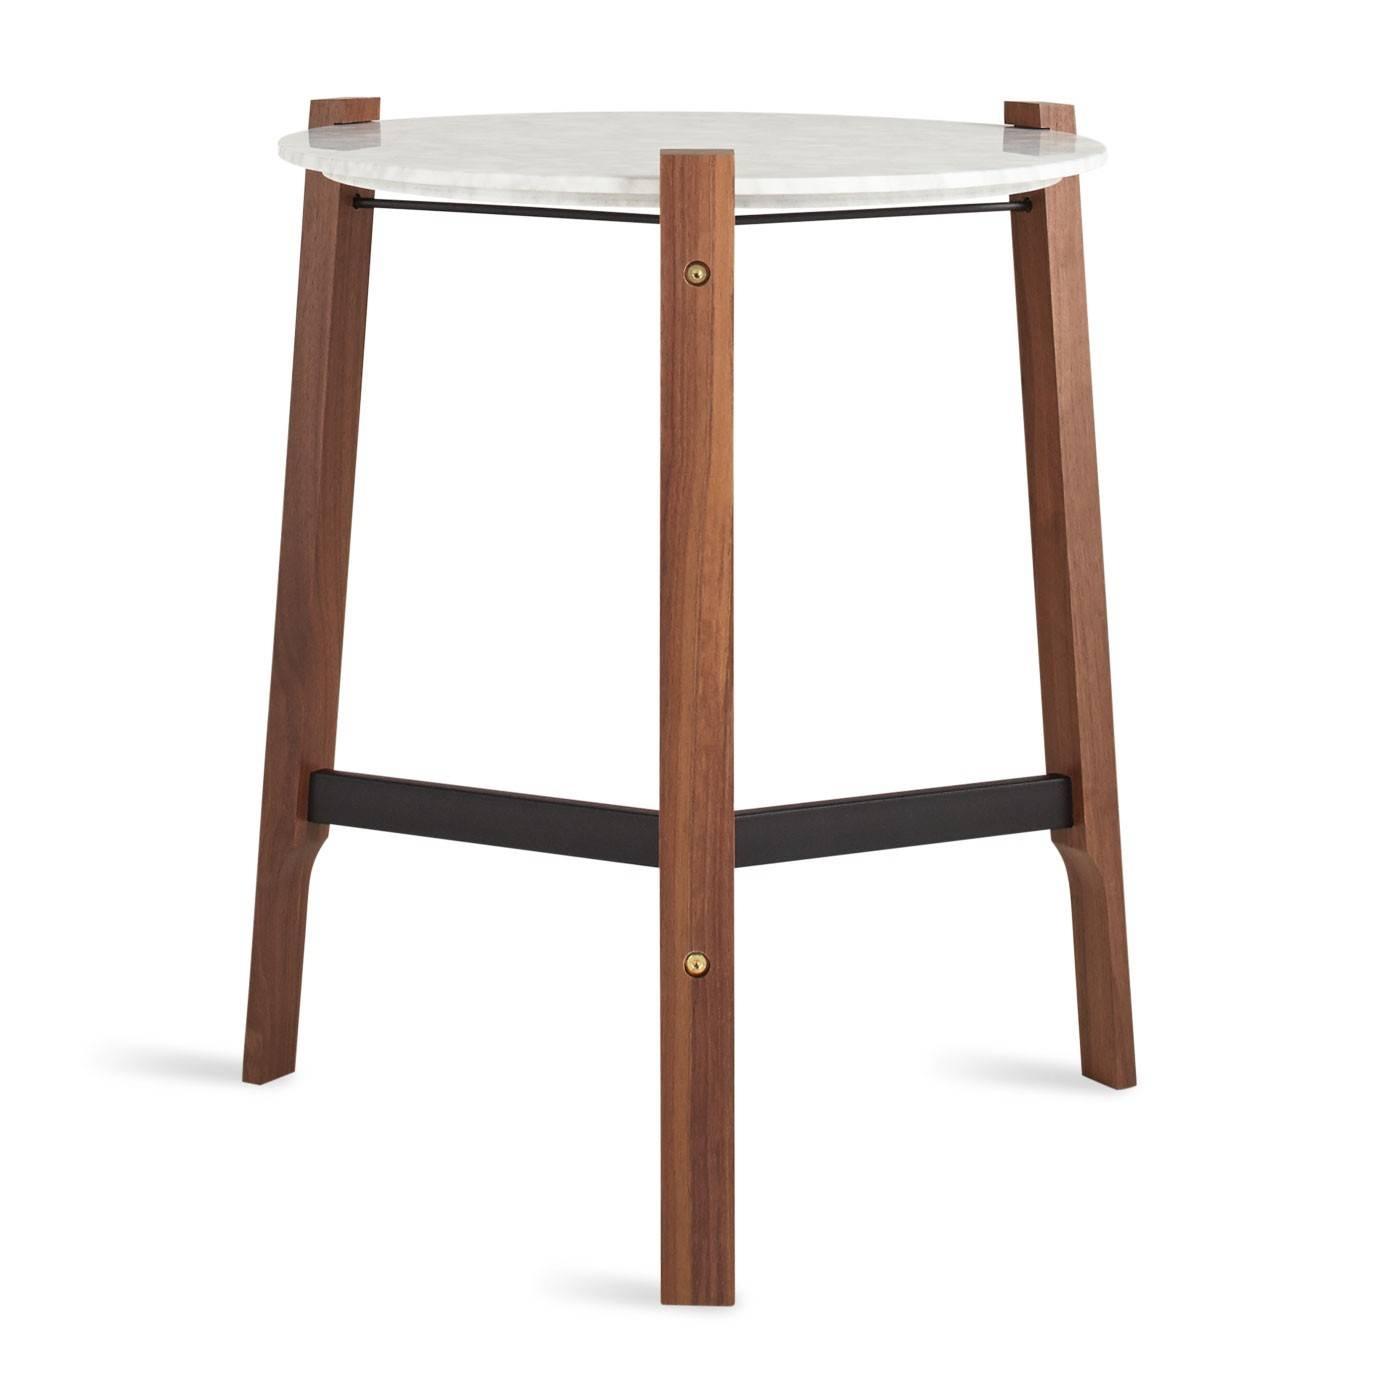 Free Range Coffee Table – Modern Side & Console Tables – Blu Dot For Range Coffee Tables (View 16 of 30)